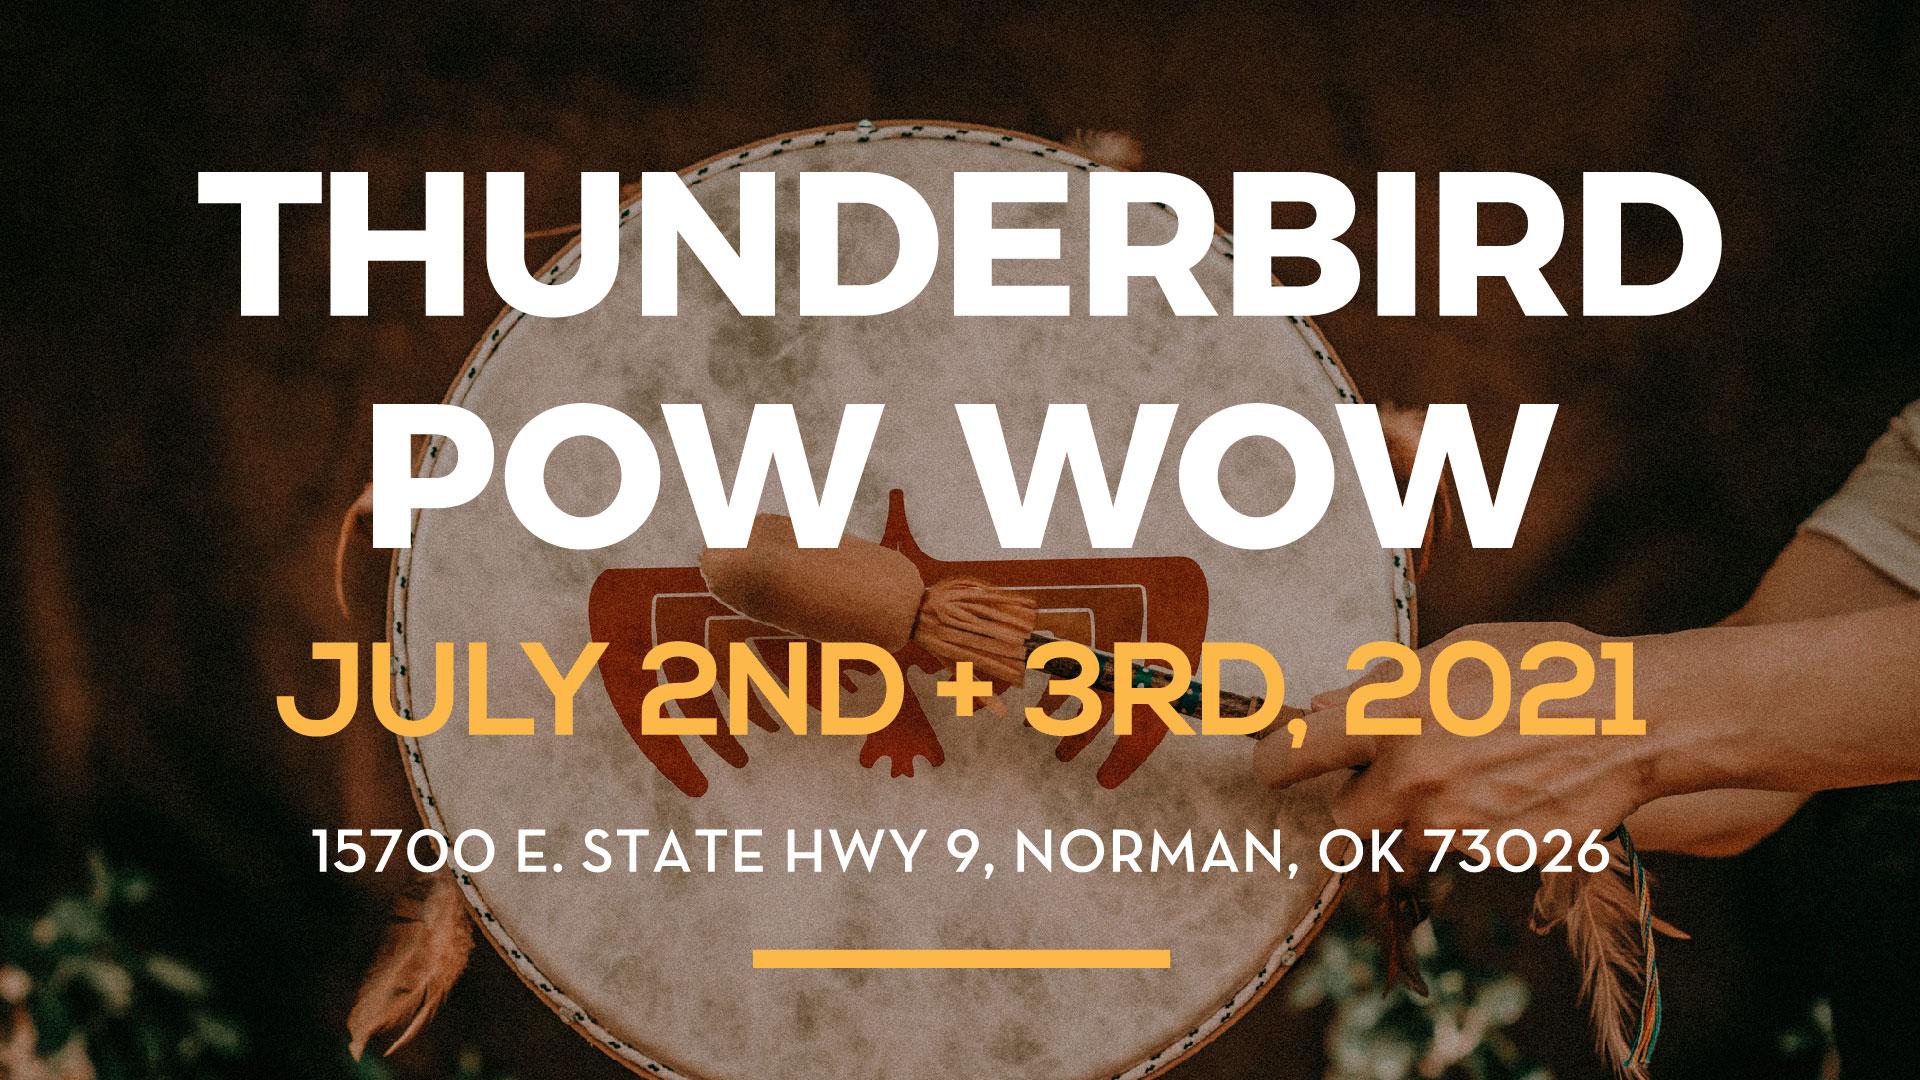 Powwow Thunderbird Web Header SCREEN V3